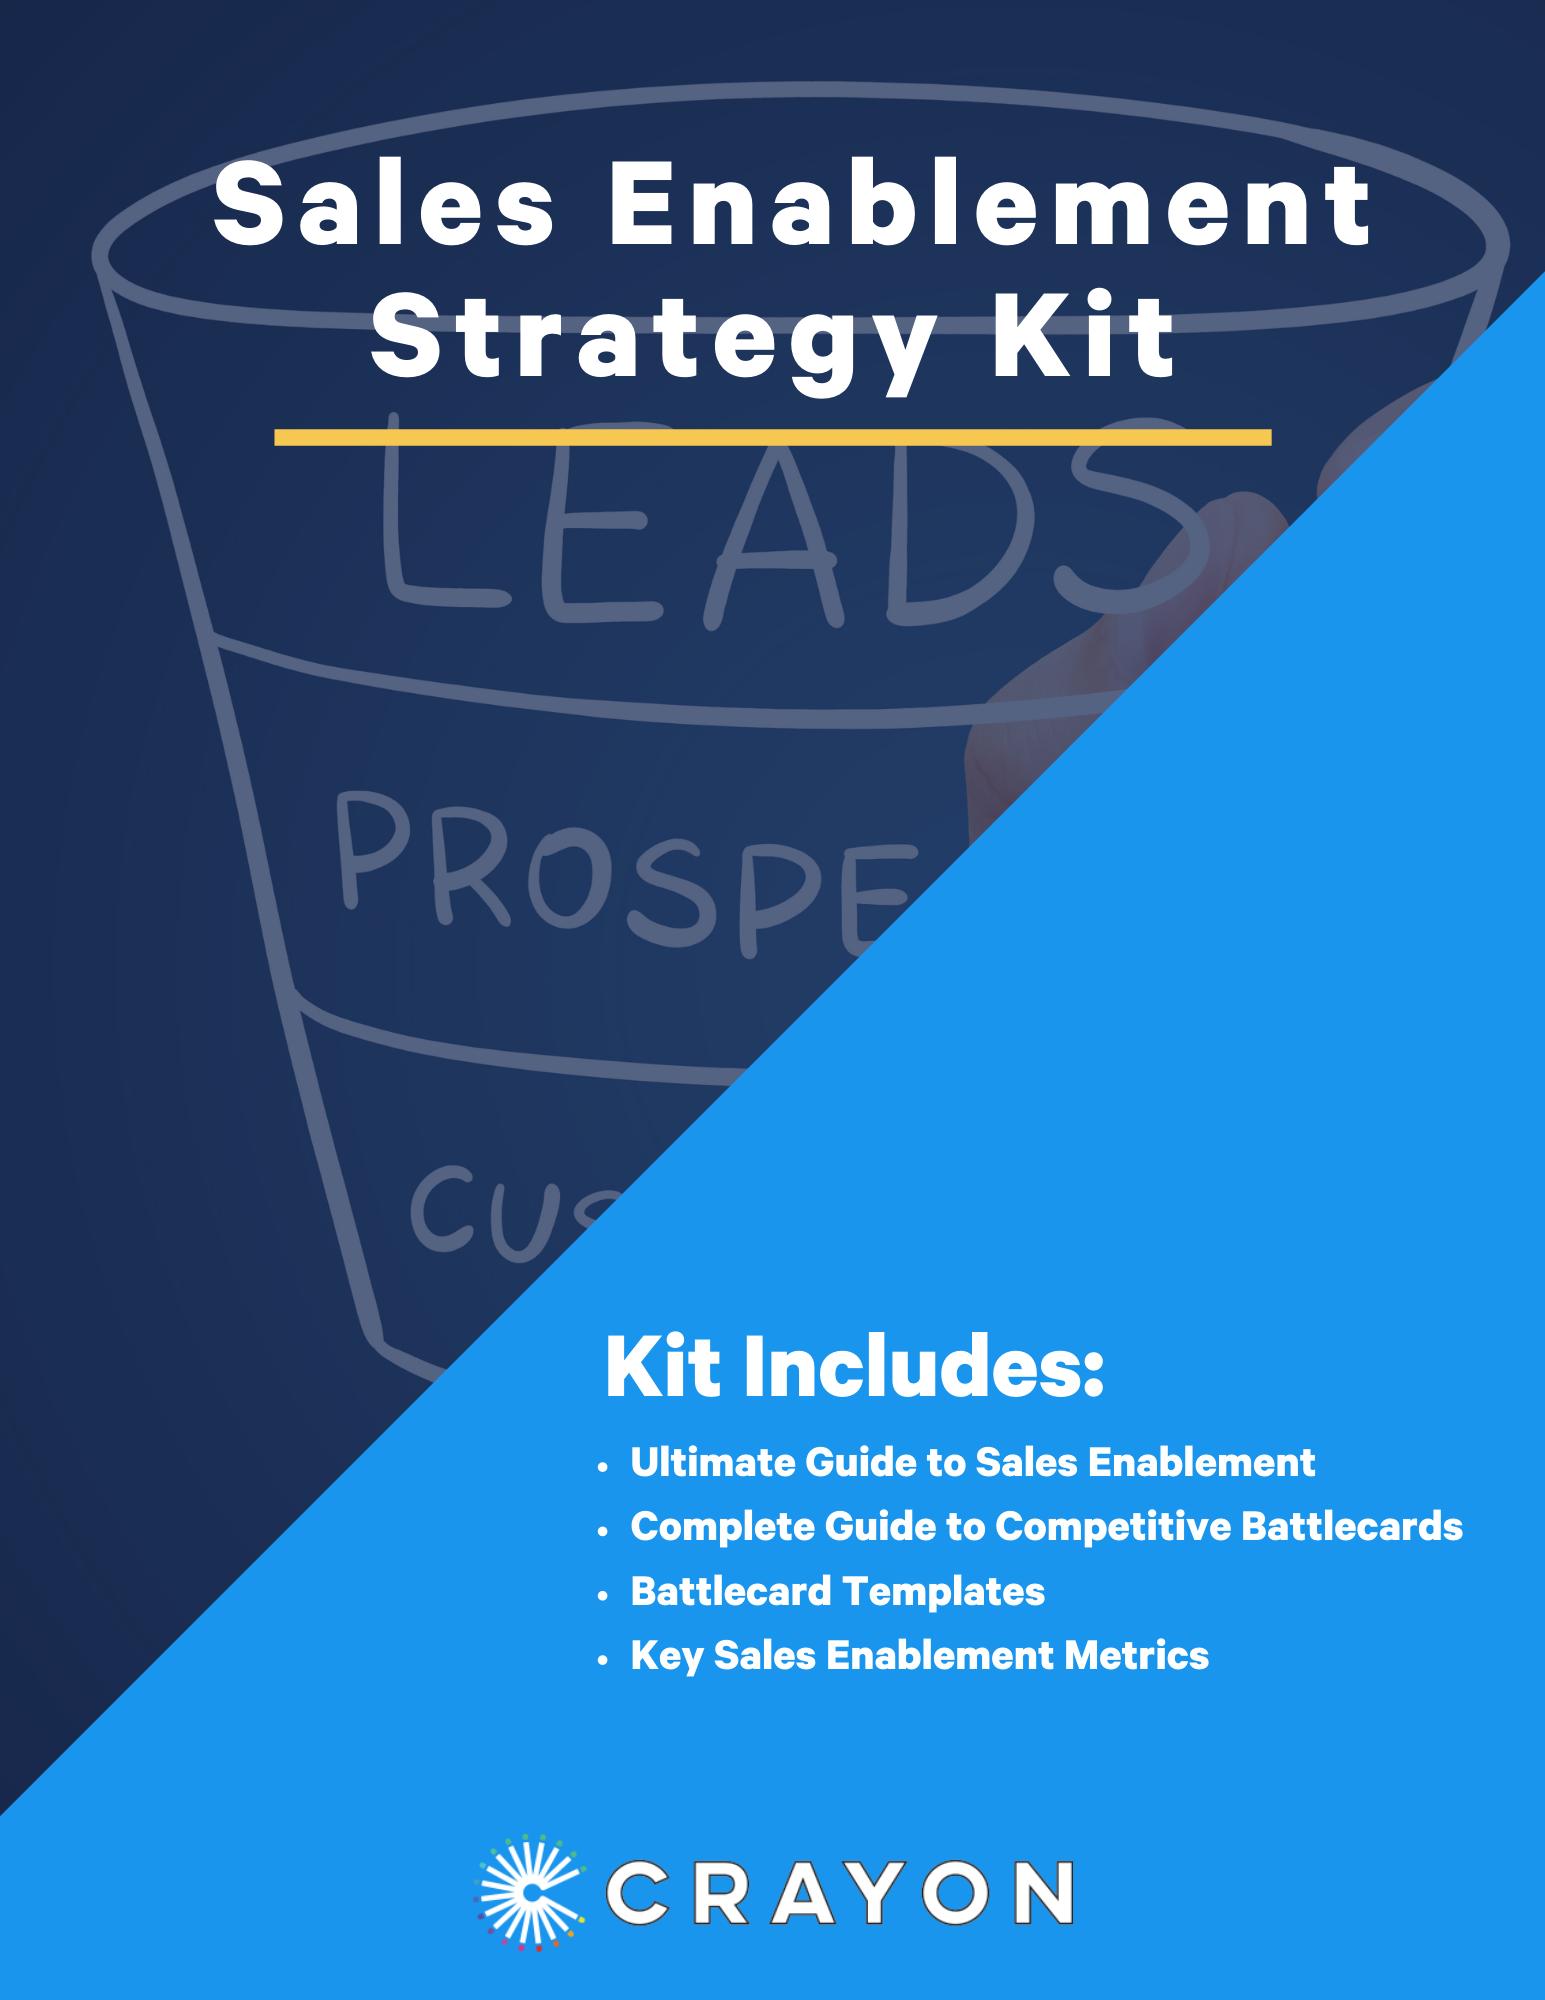 Sales Enablement Strategy Kit